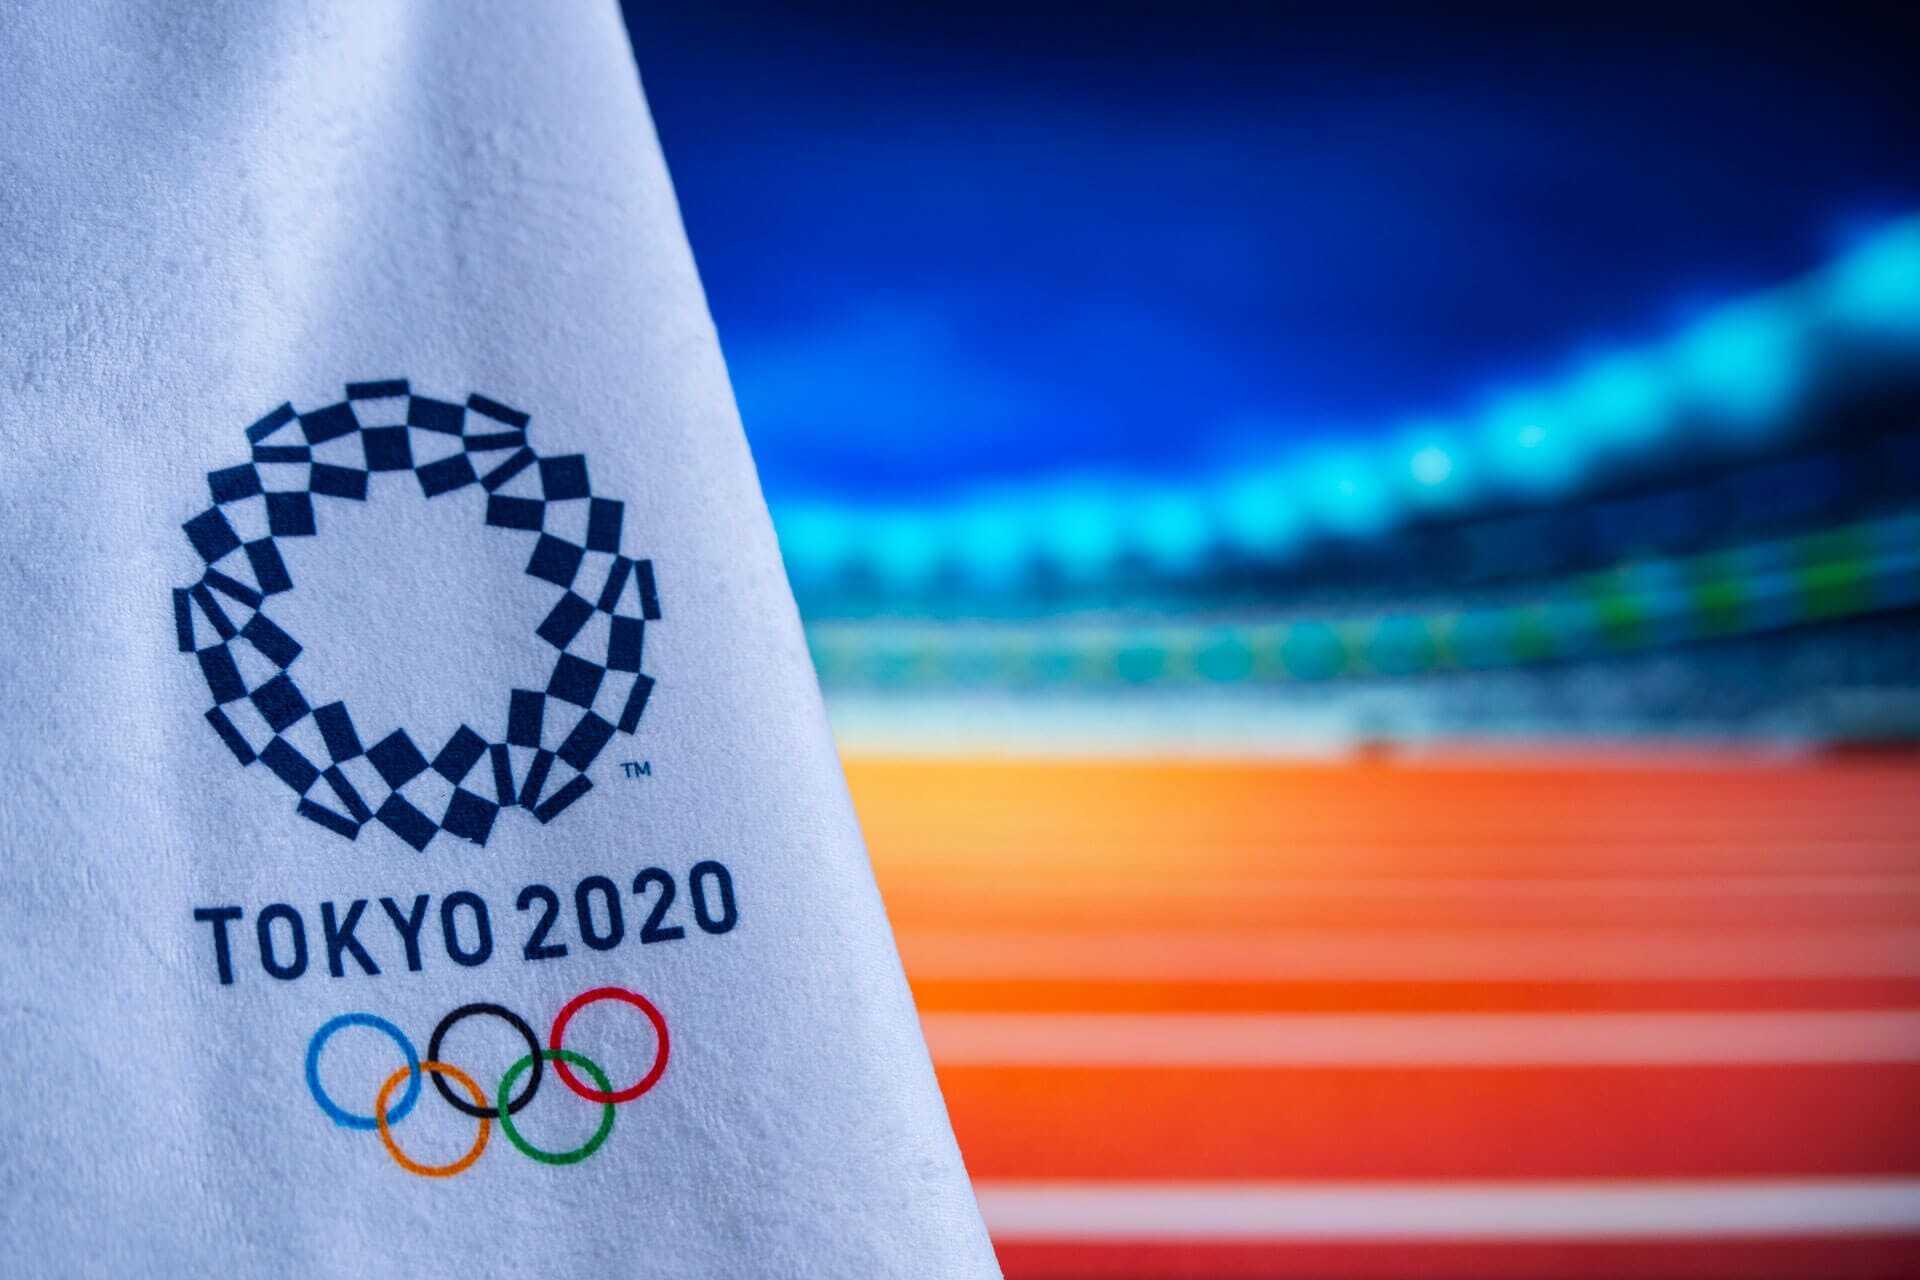 immagine bandiera olimpiadi tokyo 2020